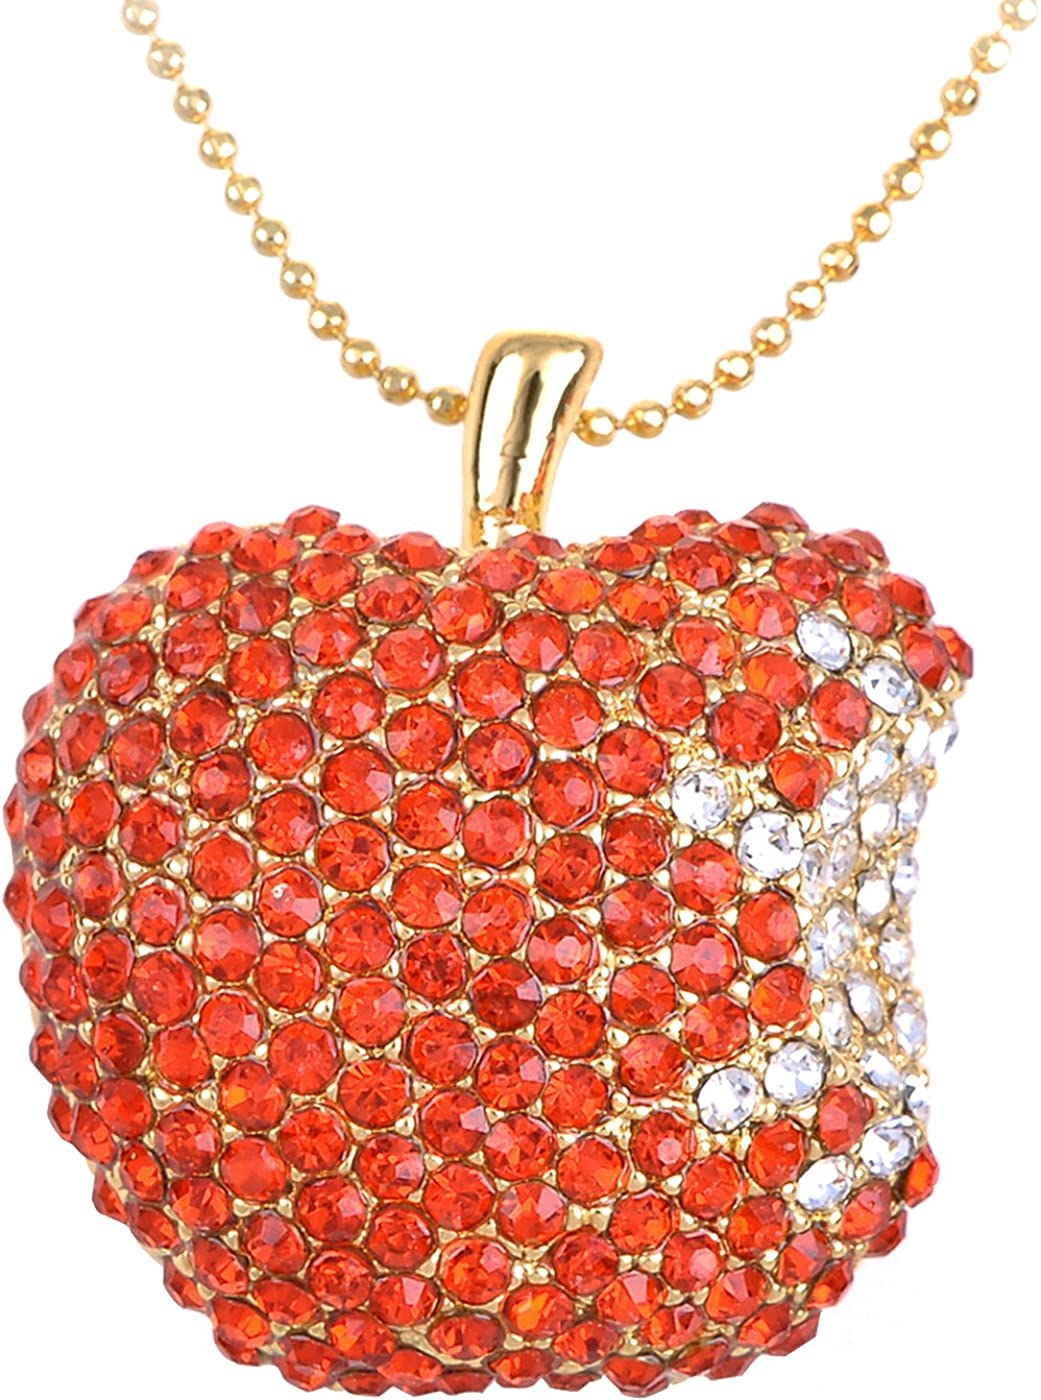 Alilang Golden Tone Red Rhinestones Bitten Apple Fruit Pendant Chain Necklace